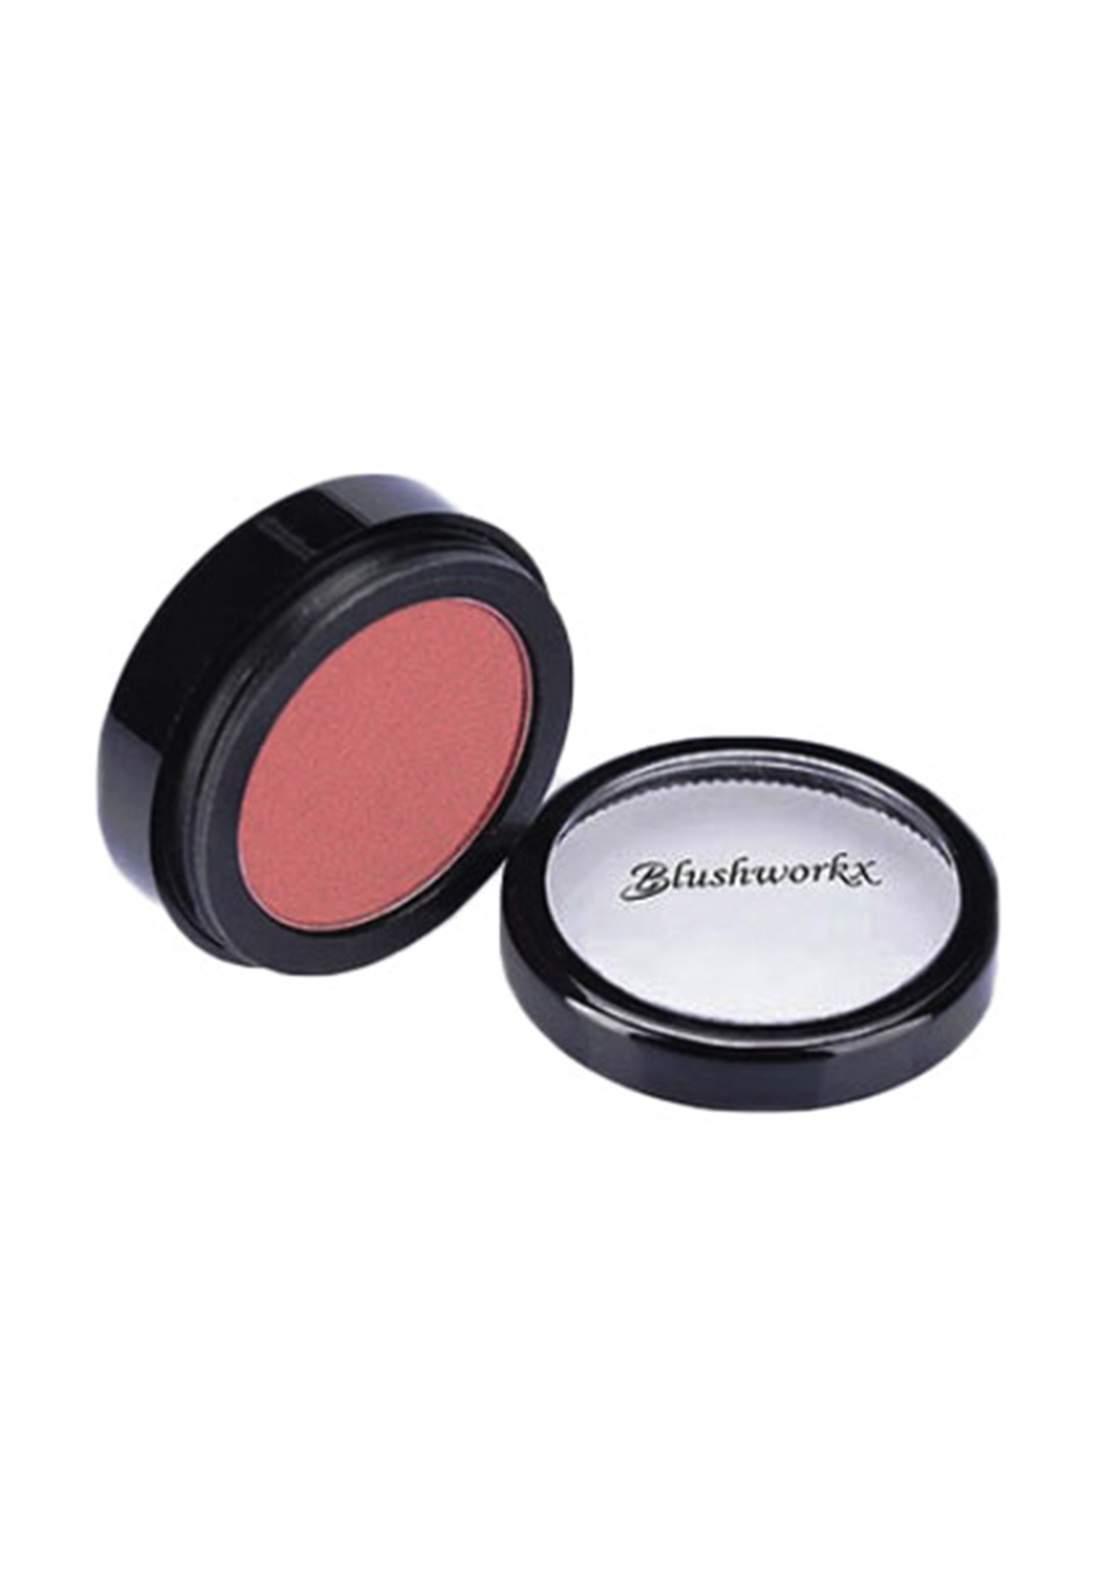 Blushworkx Hollywood Blush 1.4g Mild Pink مورد خدود